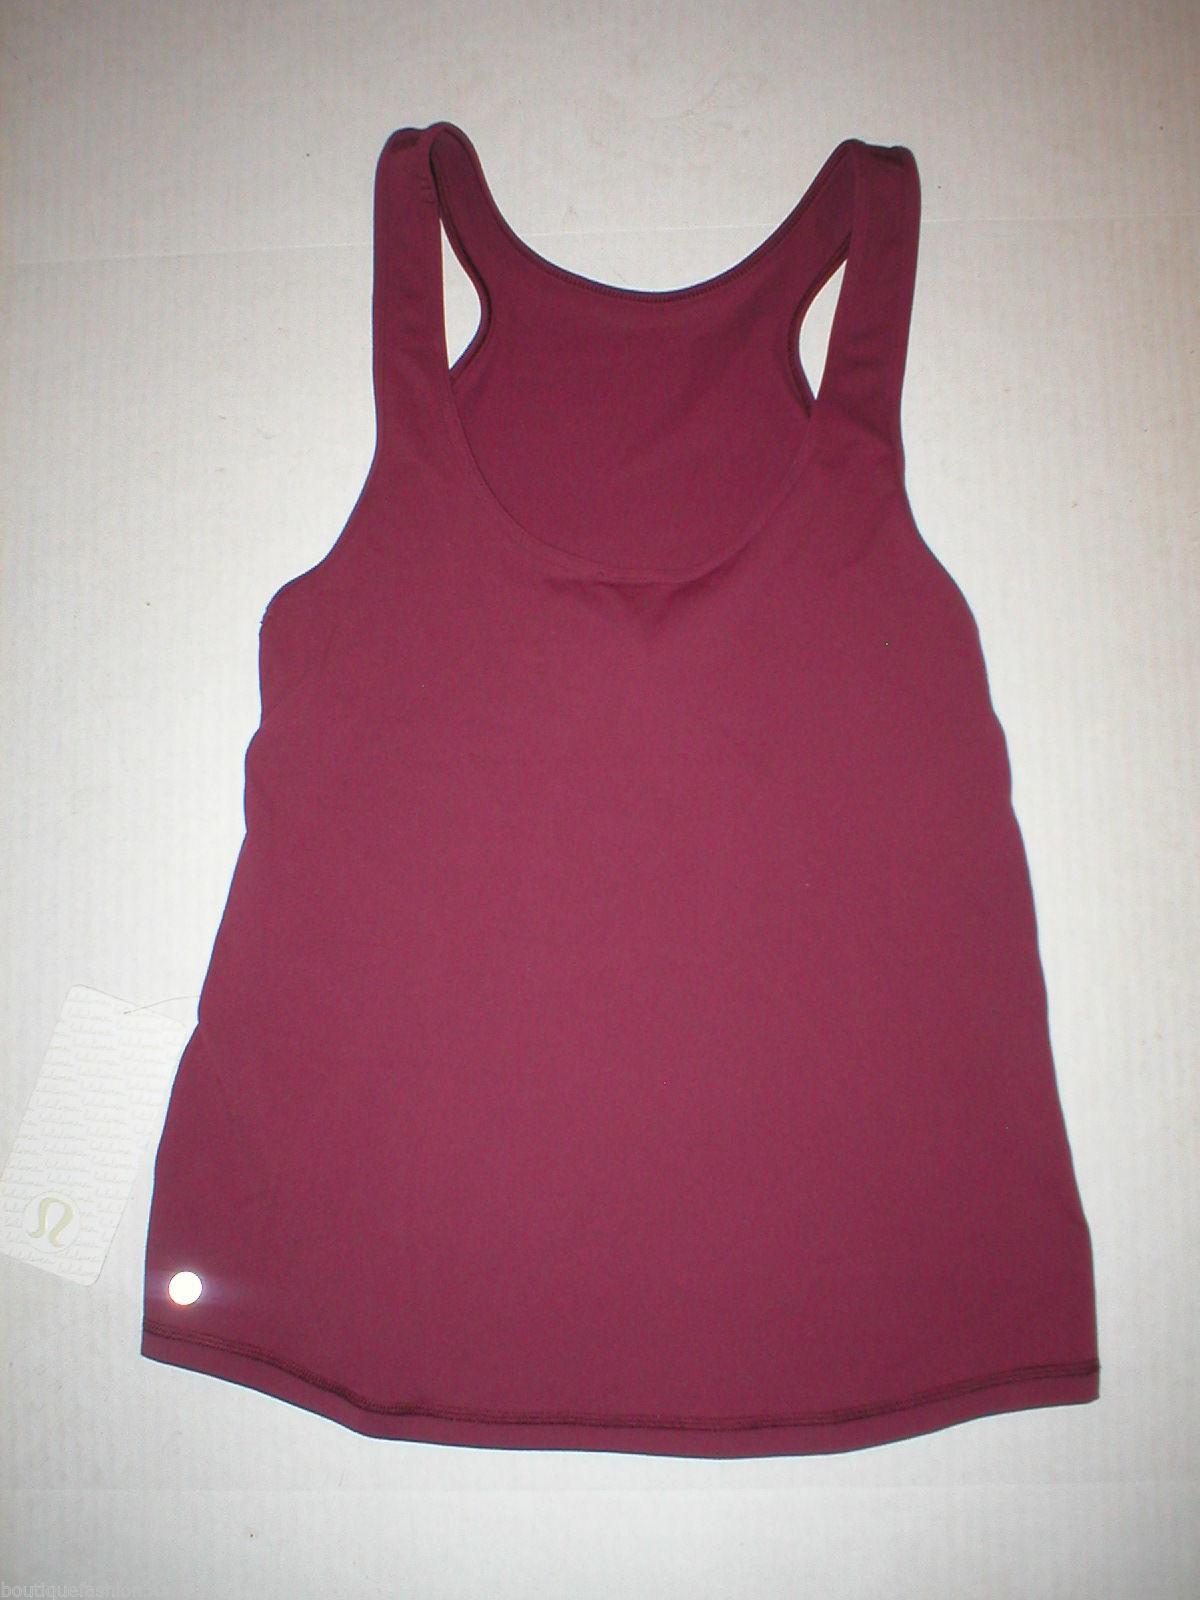 Womens Lululemon Tank Top Hot Yoga 10 Pilates NWT New Dark Red Workout Front Rac